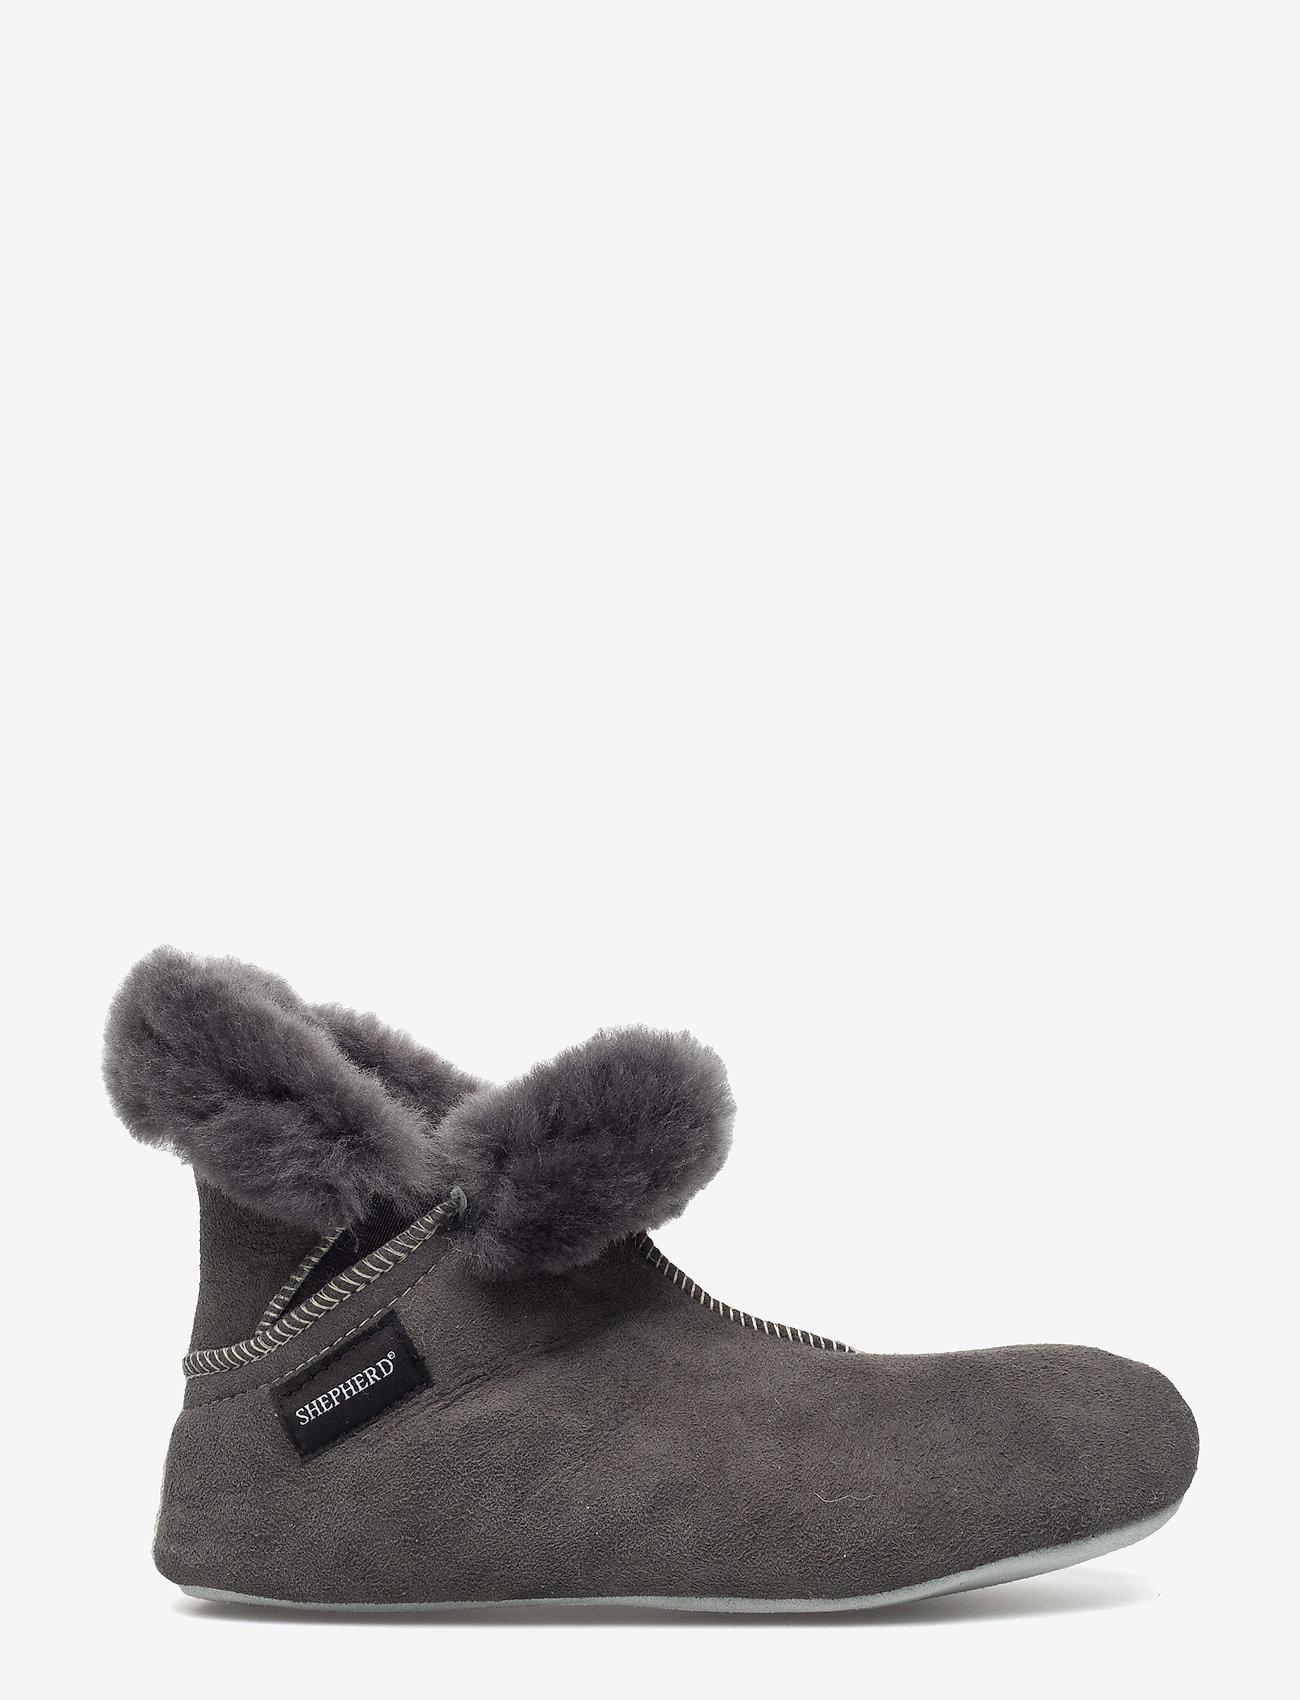 Shepherd - Mariette - pantoffels - asphalt - 1